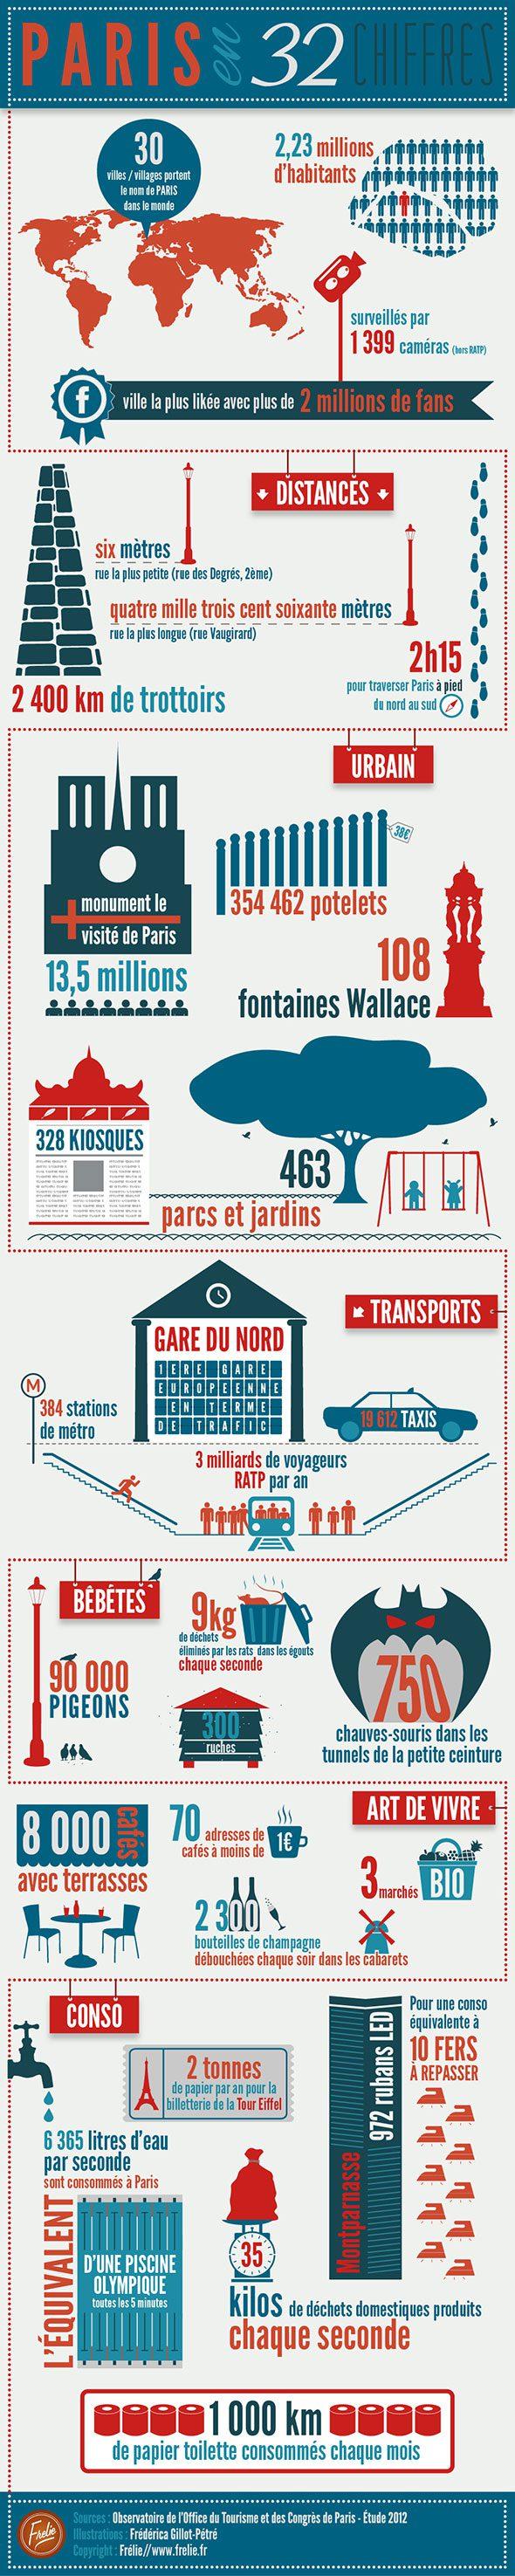 parigi-32-cifre